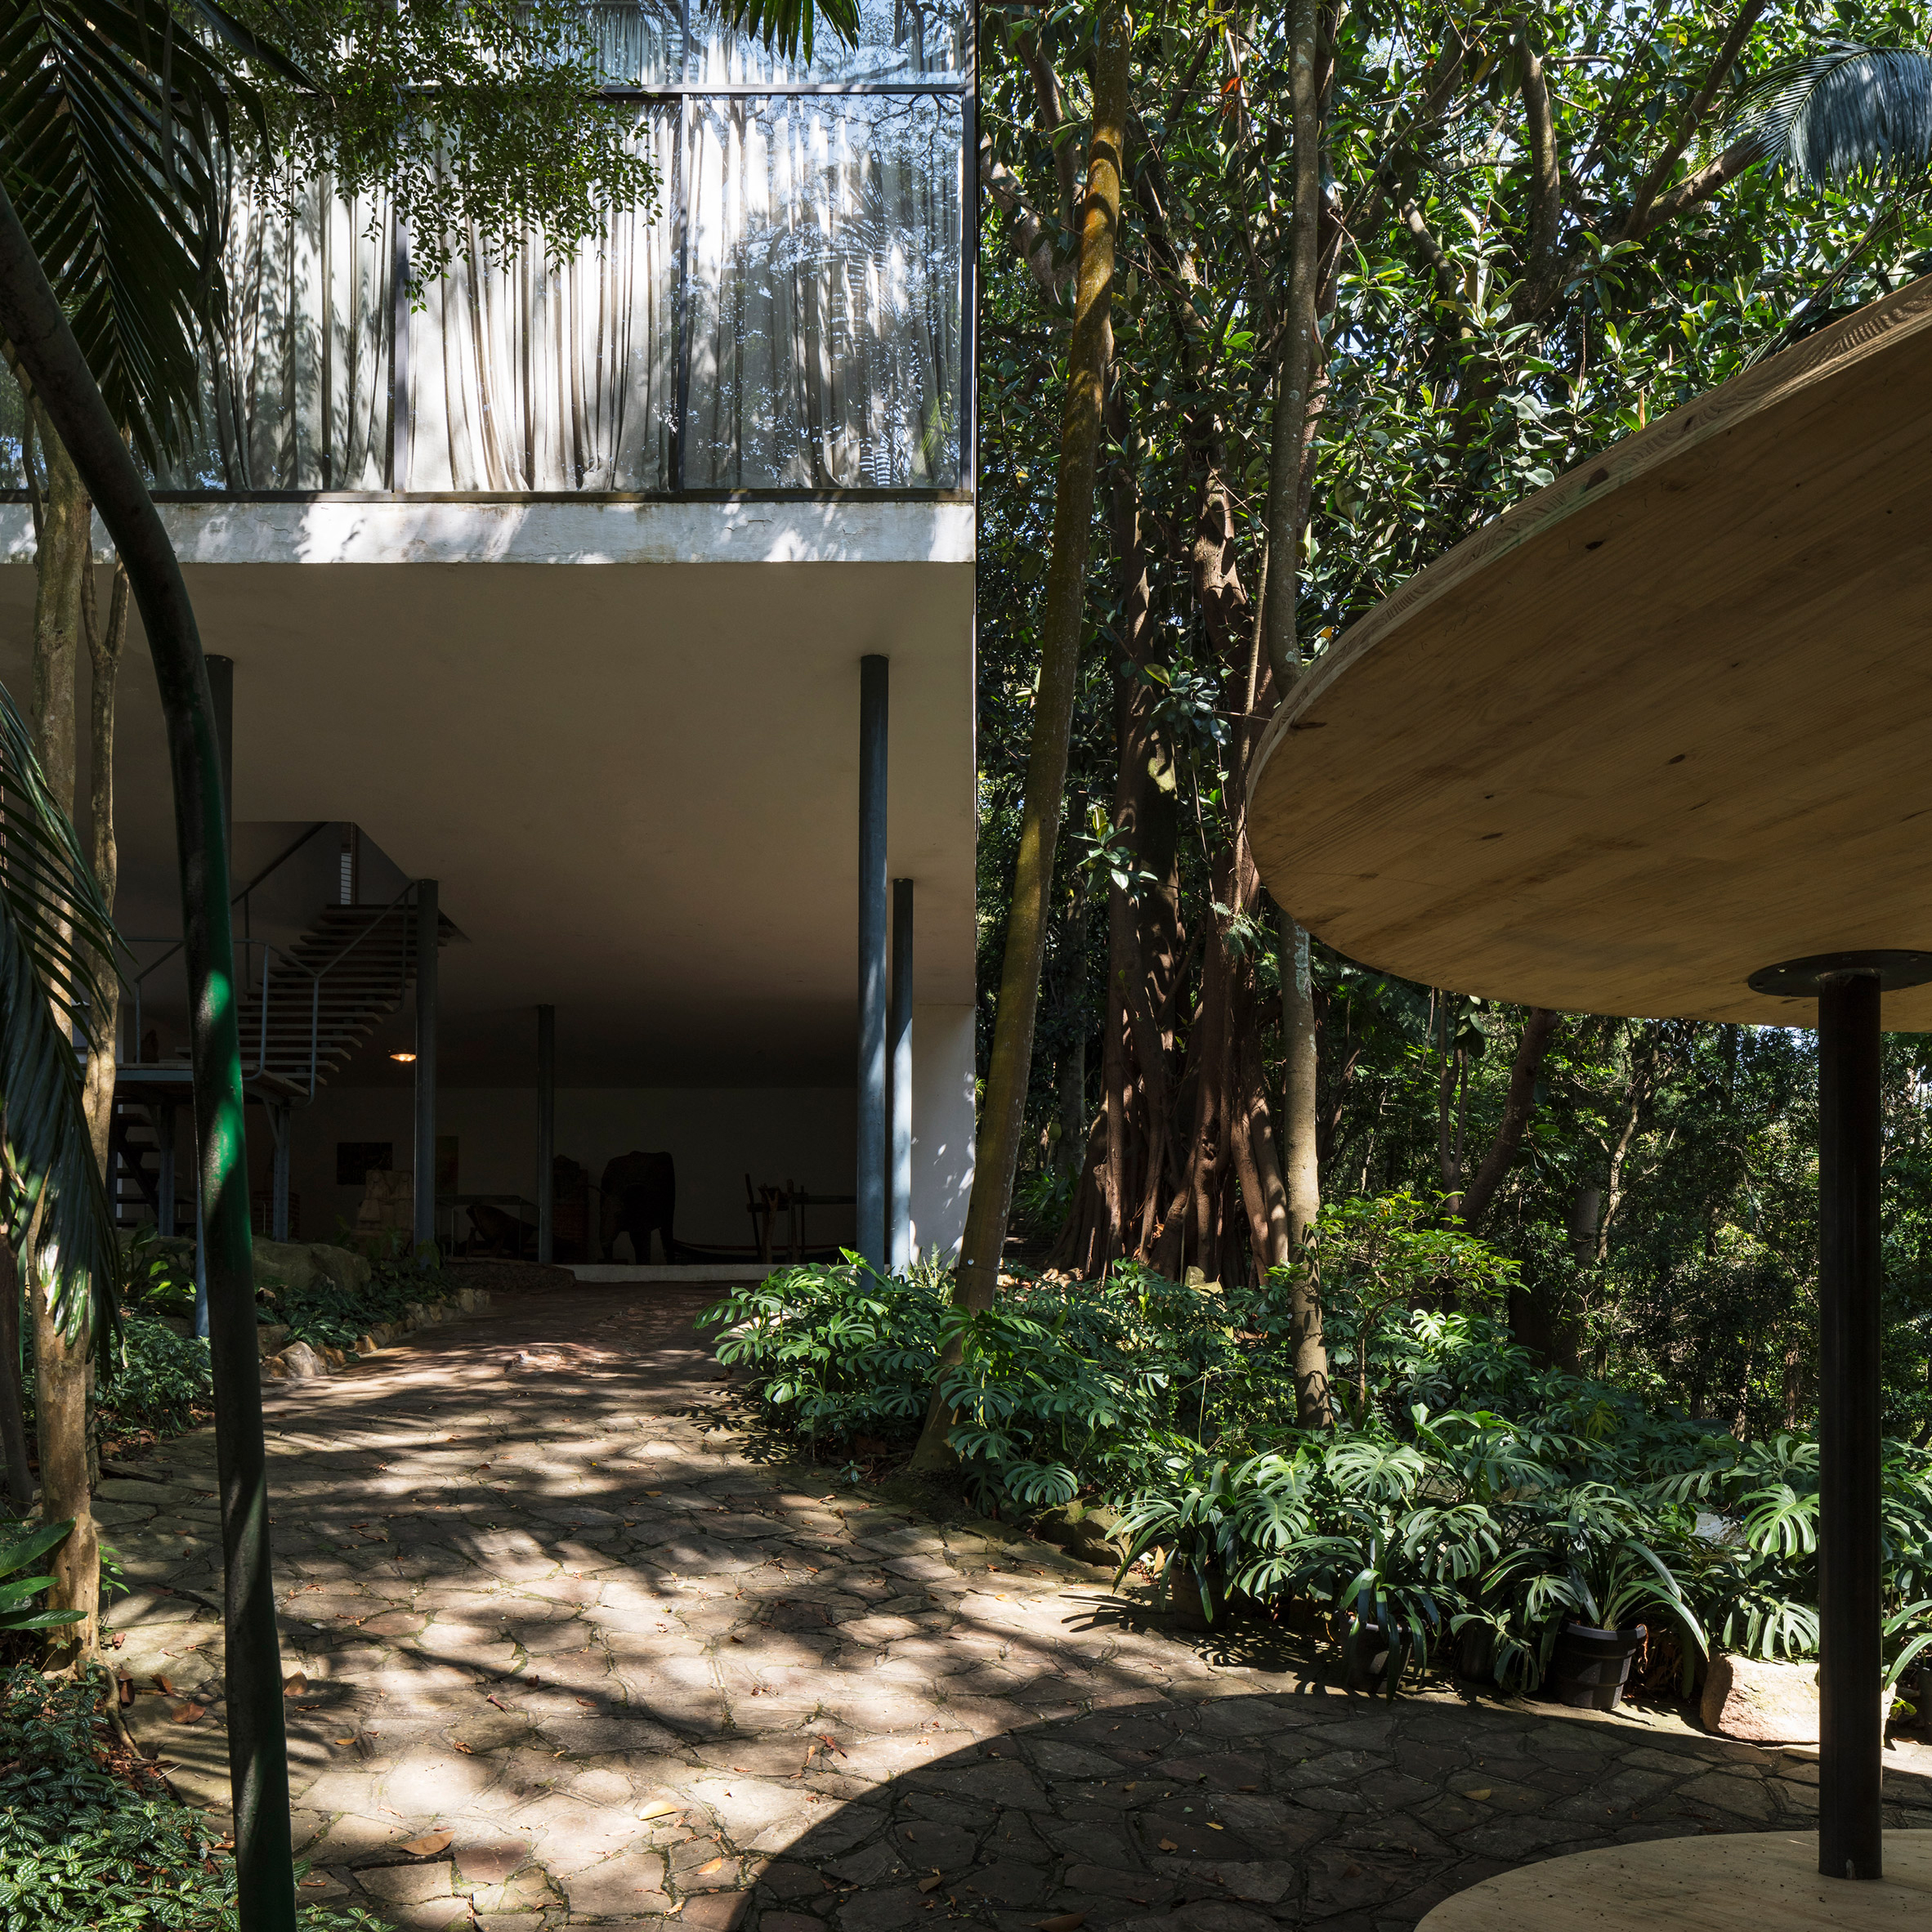 Summerarchitecture and designexhibitions 2019